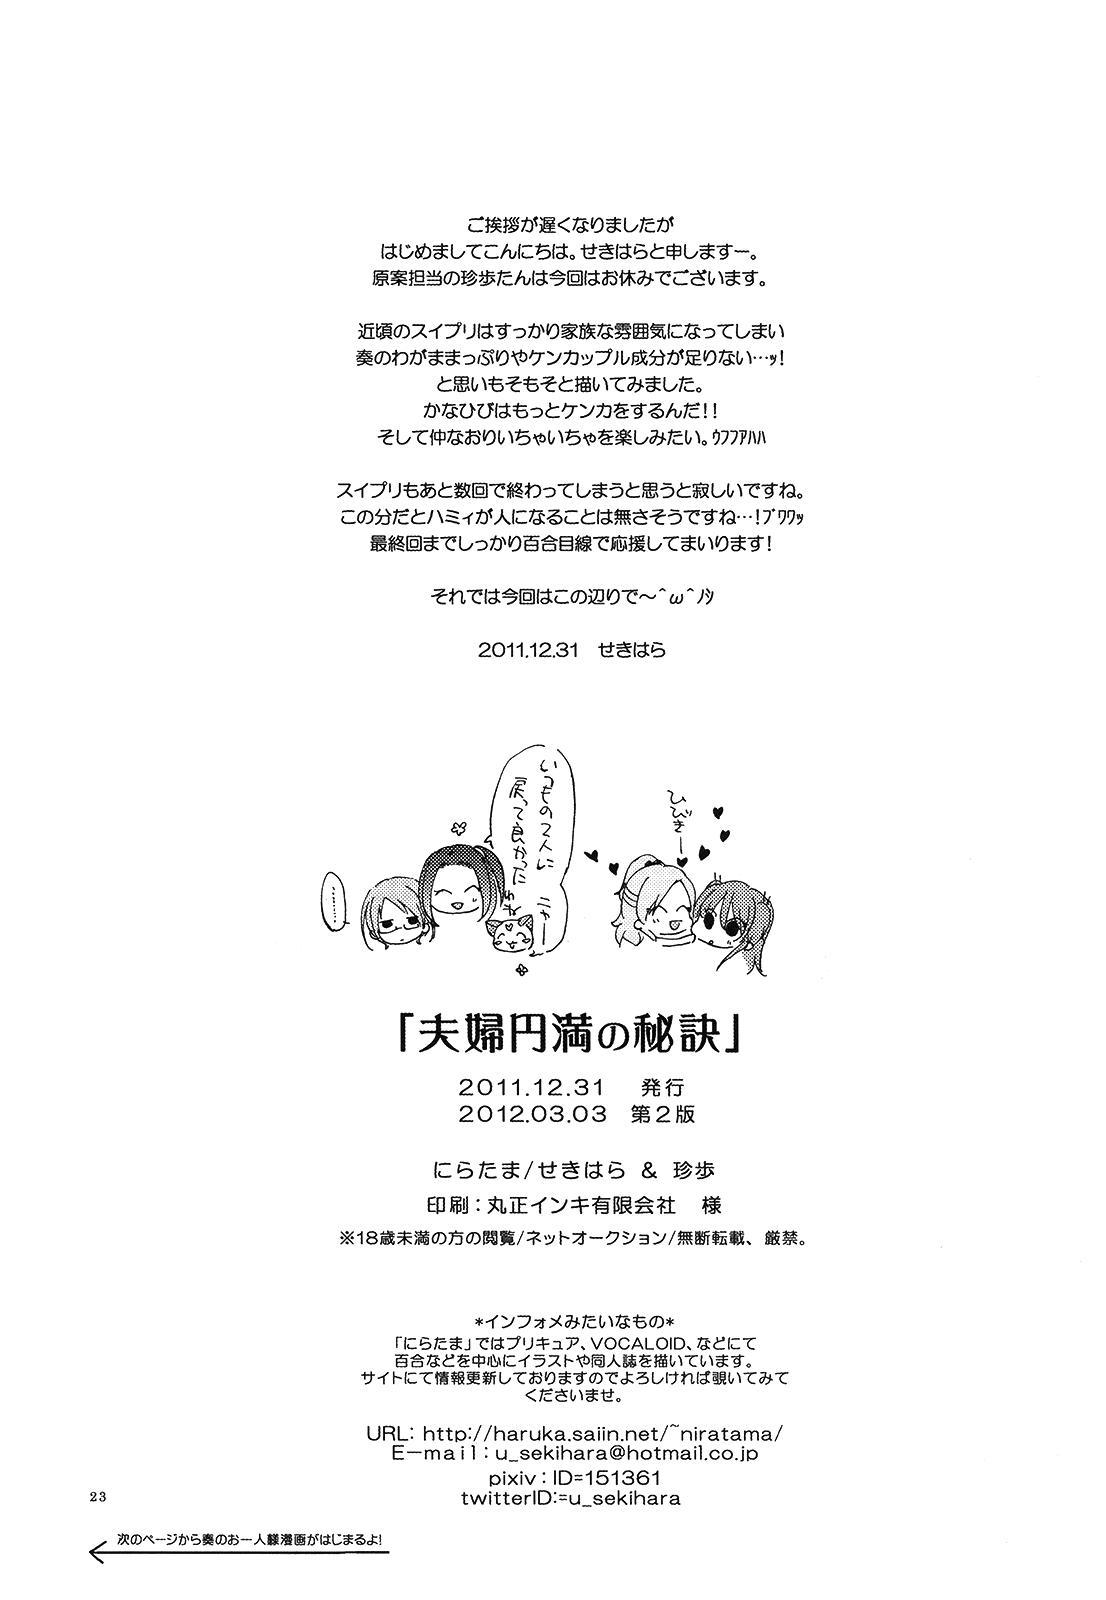 Fuufu Enman no Hiketsu | The Secret to a Happy Marriage 21